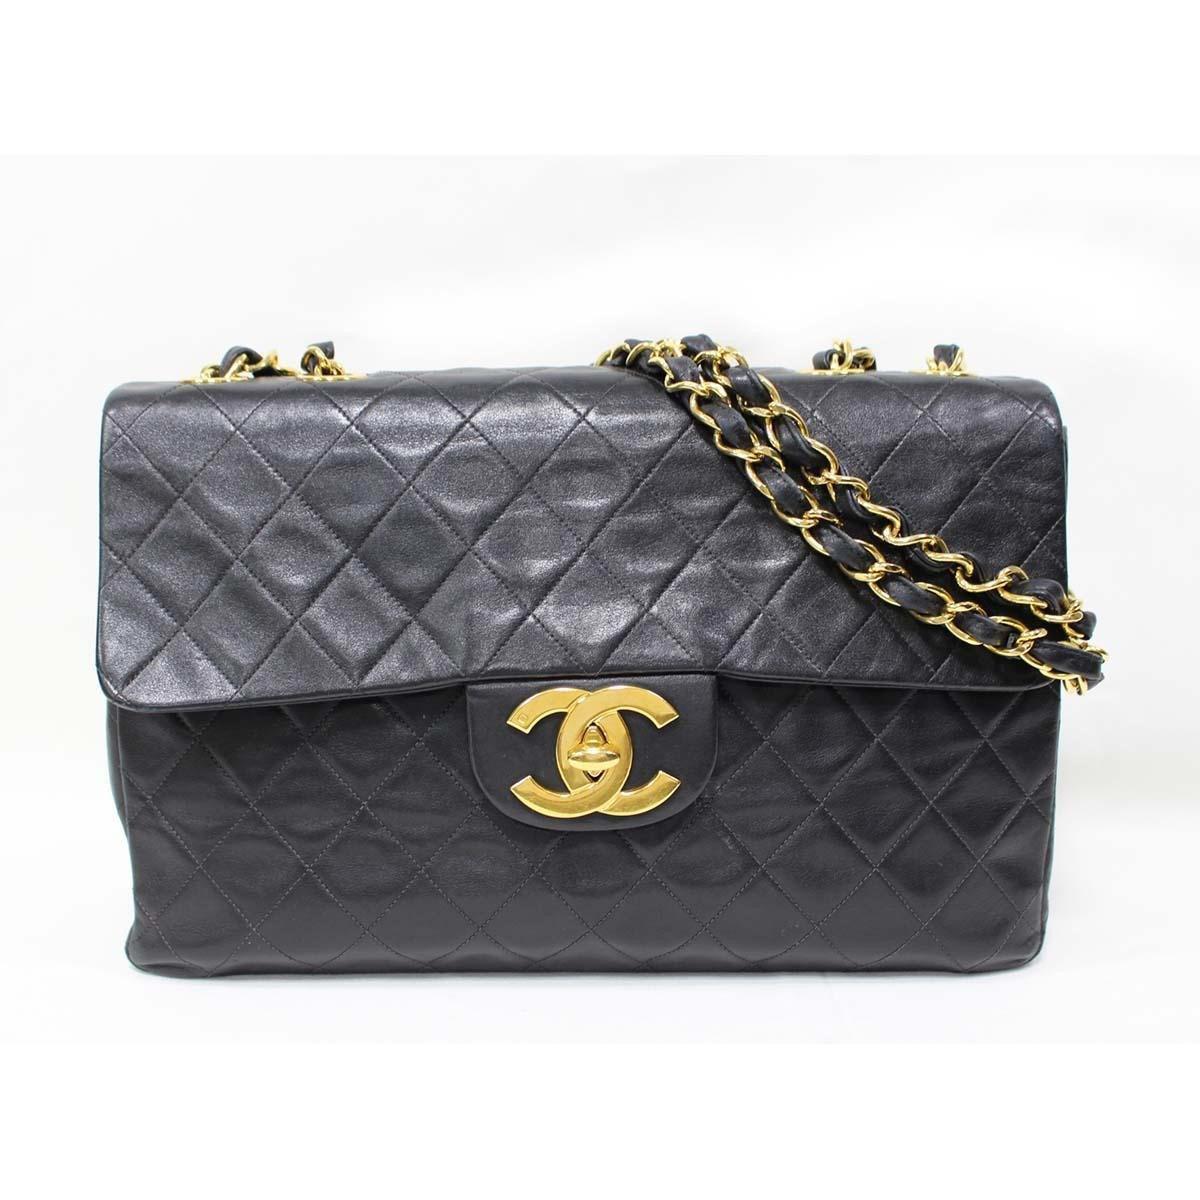 Lyst - Chanel Jumbo Deca Matelasse Chain Shoulder Crossbody Bag ... dd10667a708ff